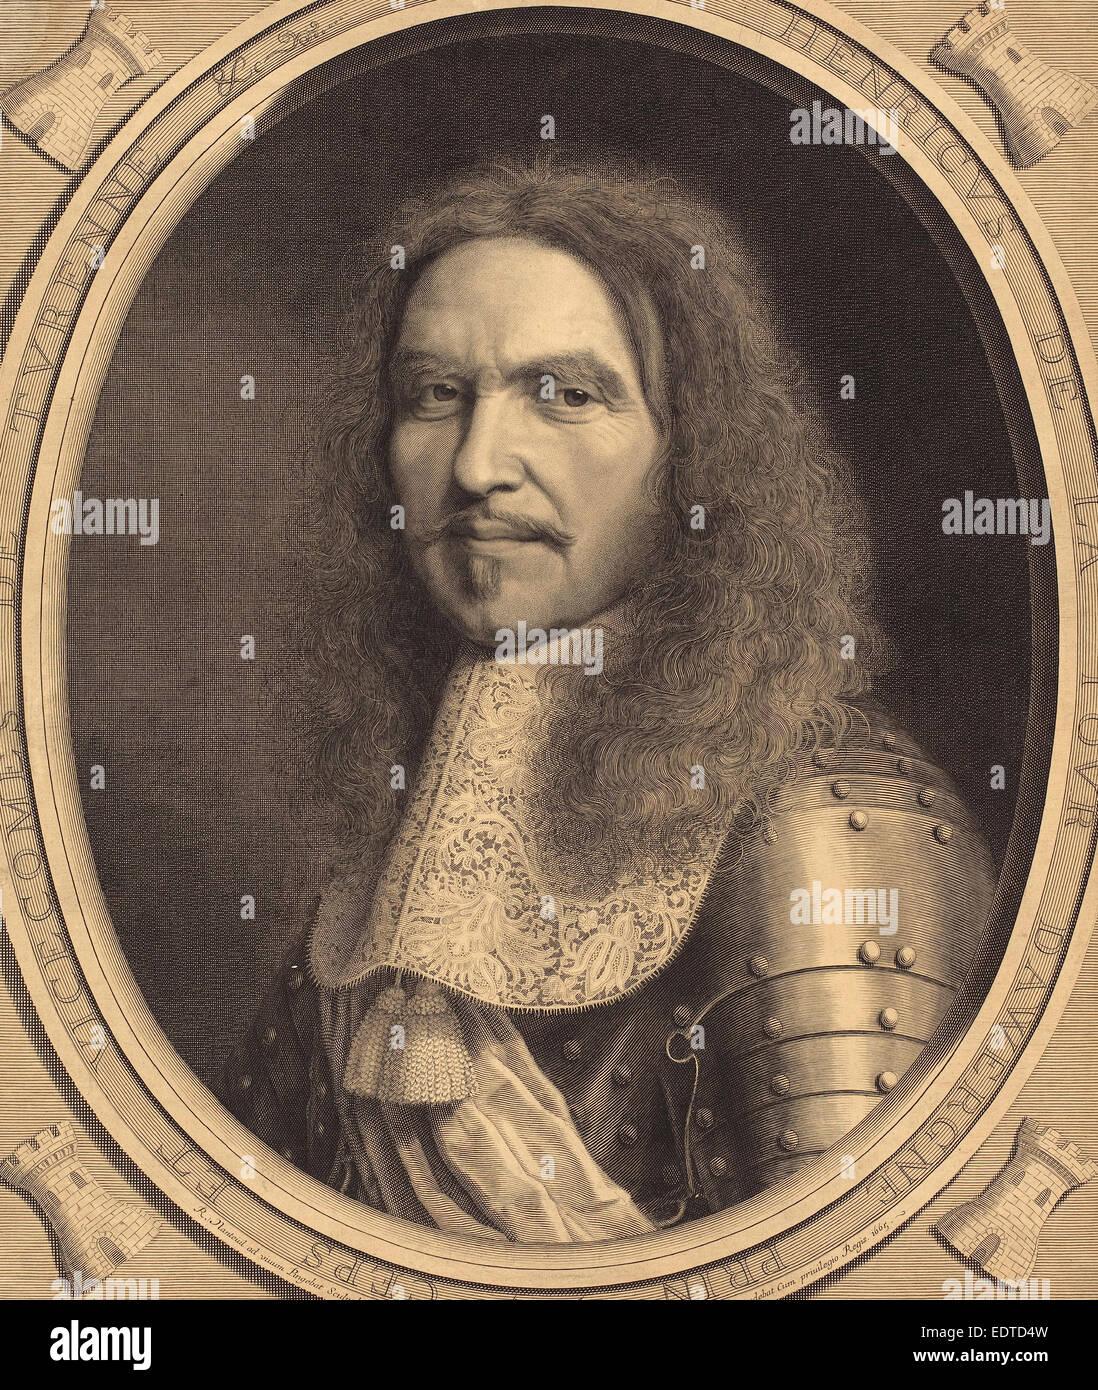 Robert Nanteuil (French, 1623 - 1678), Marechal de Turenne, 1665, engraving - Stock Image